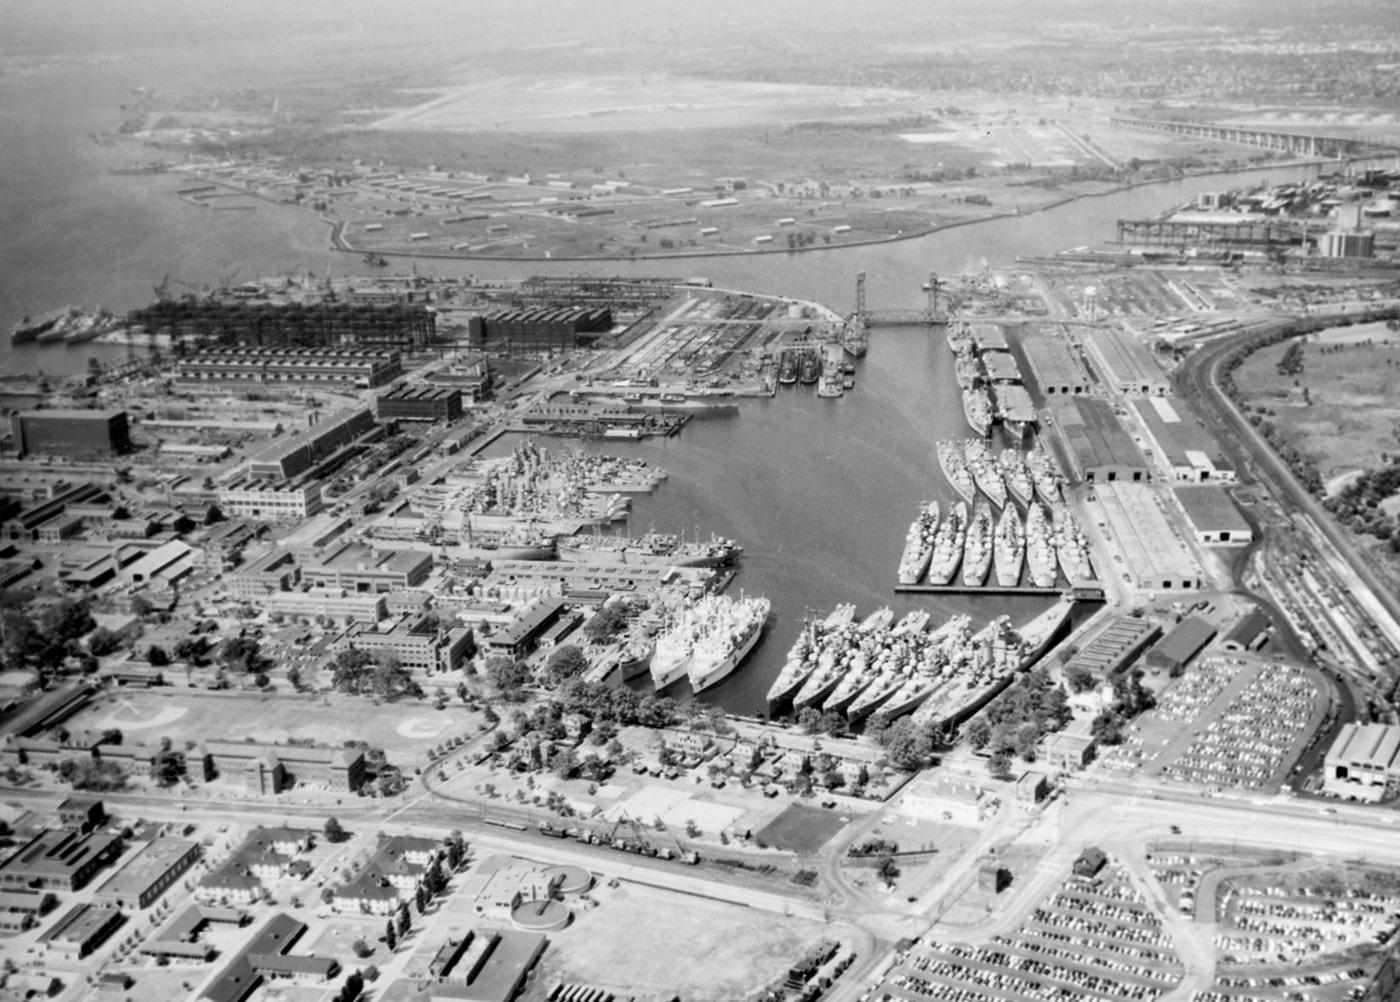 Philadelphia Naval Shipyard aerial view